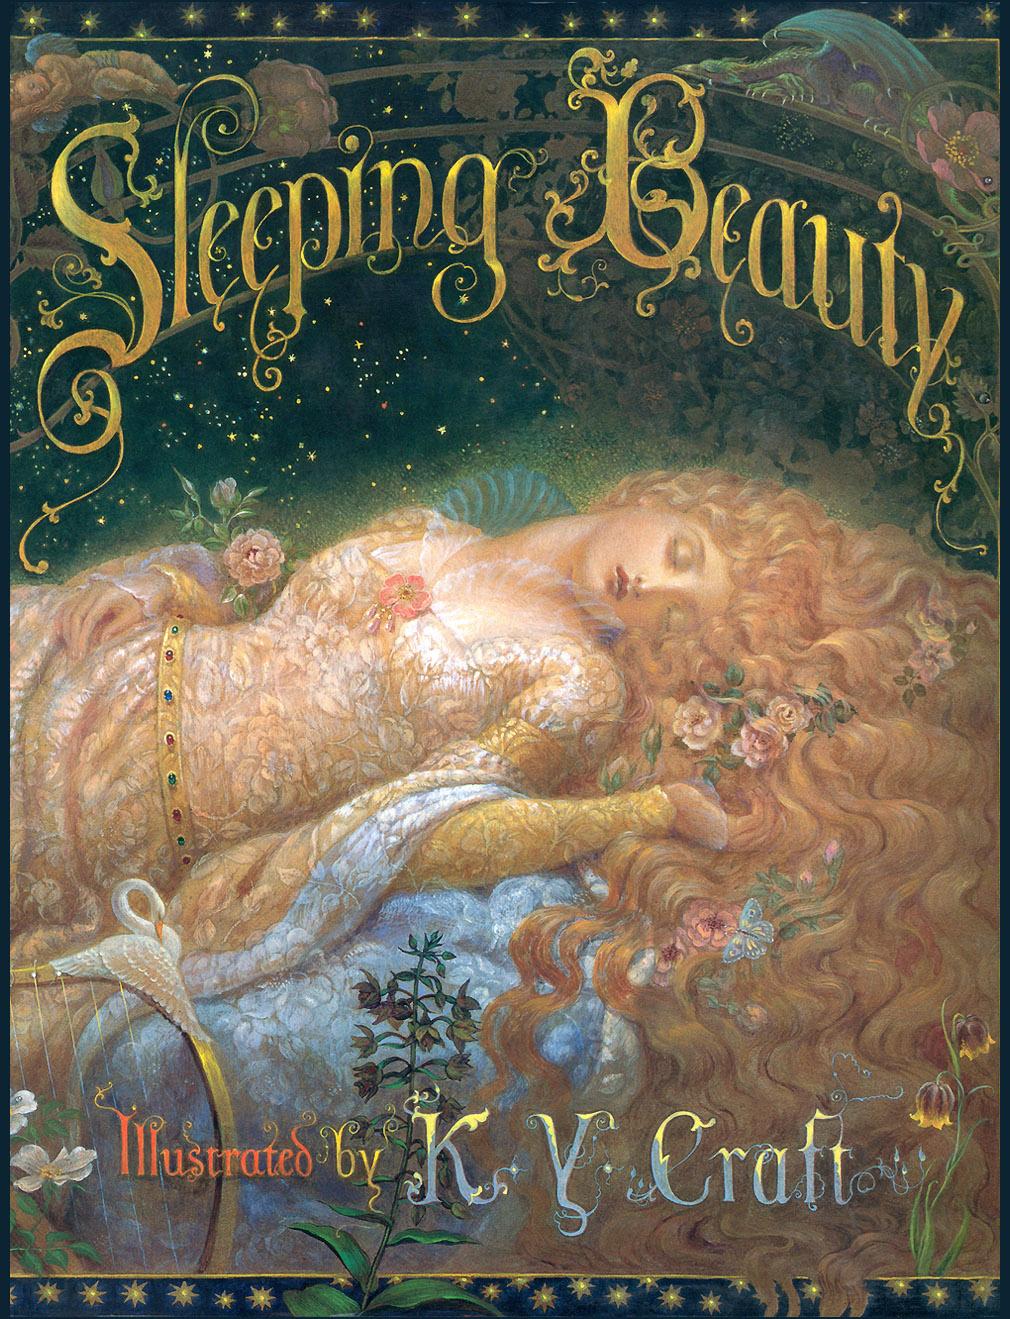 Kinuko Kraft. Sleeping beauty. Cover